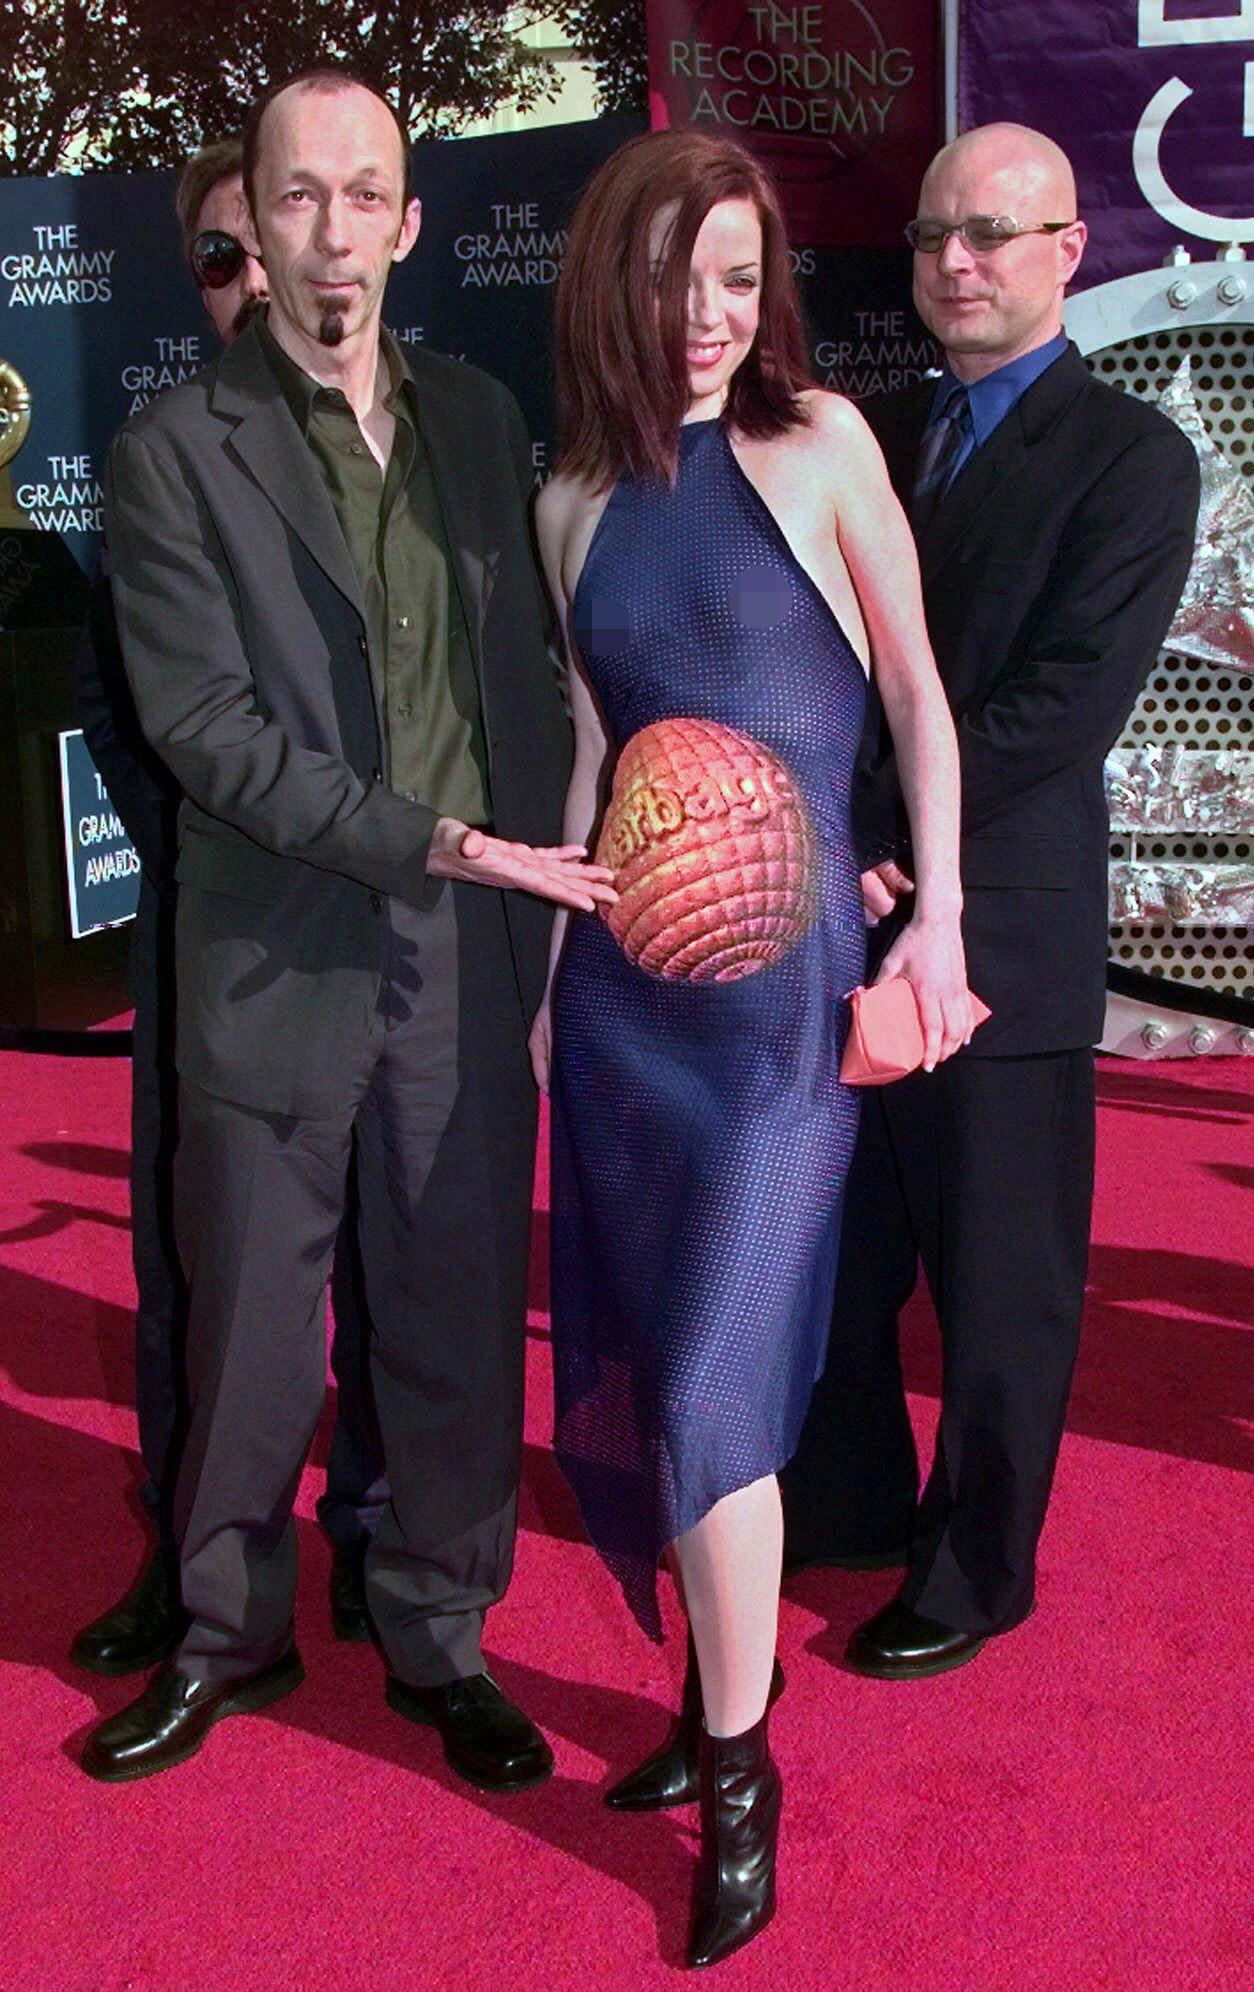 Duke Erikson and Shirley Manson